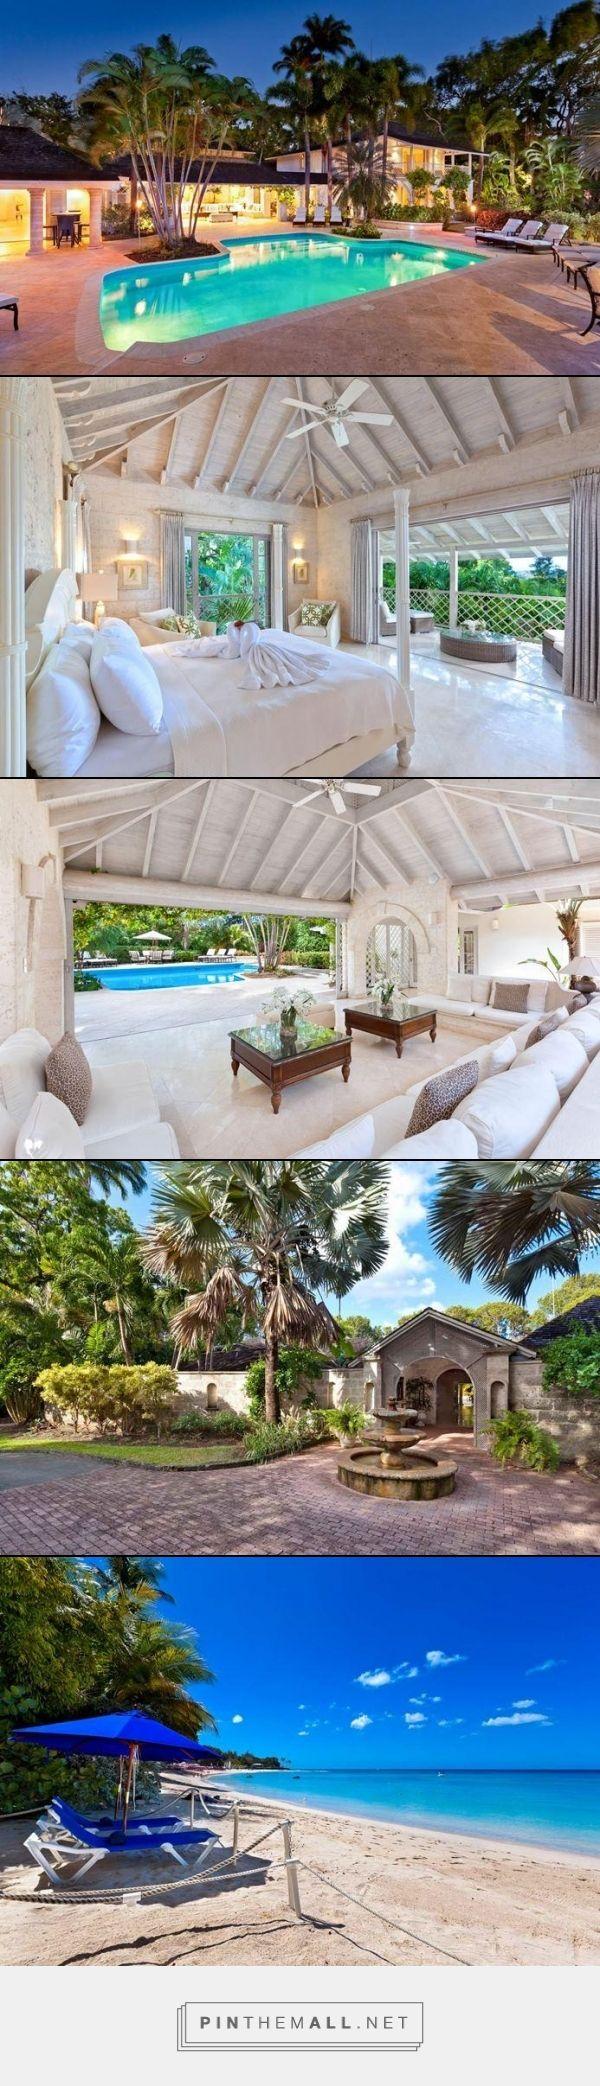 Villa Bluff House- Sandy Lane Beach - St. James, Barbados